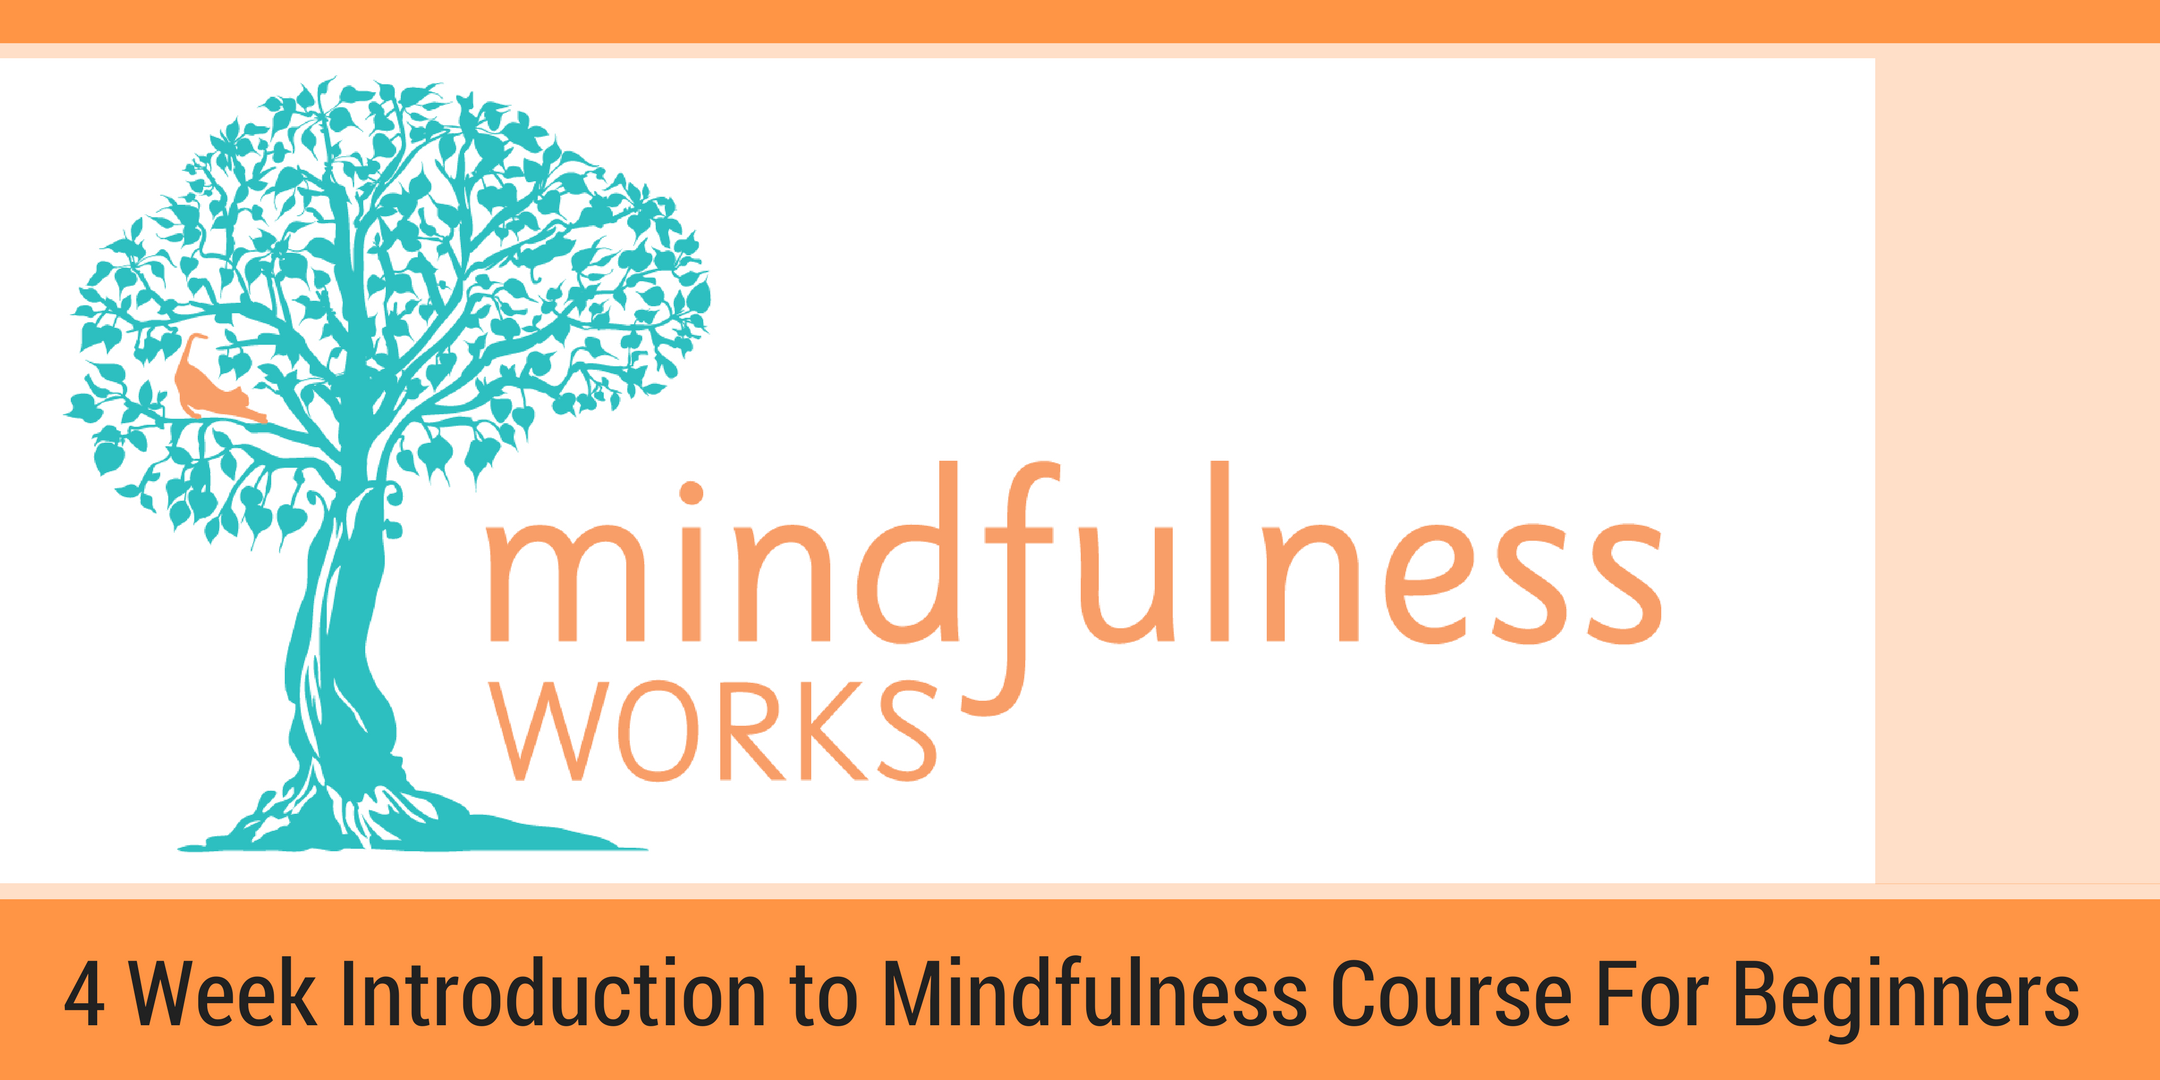 Sydney (Baulkham Hills) – An Introduction to Mindfulness & Meditation 4 Week Course